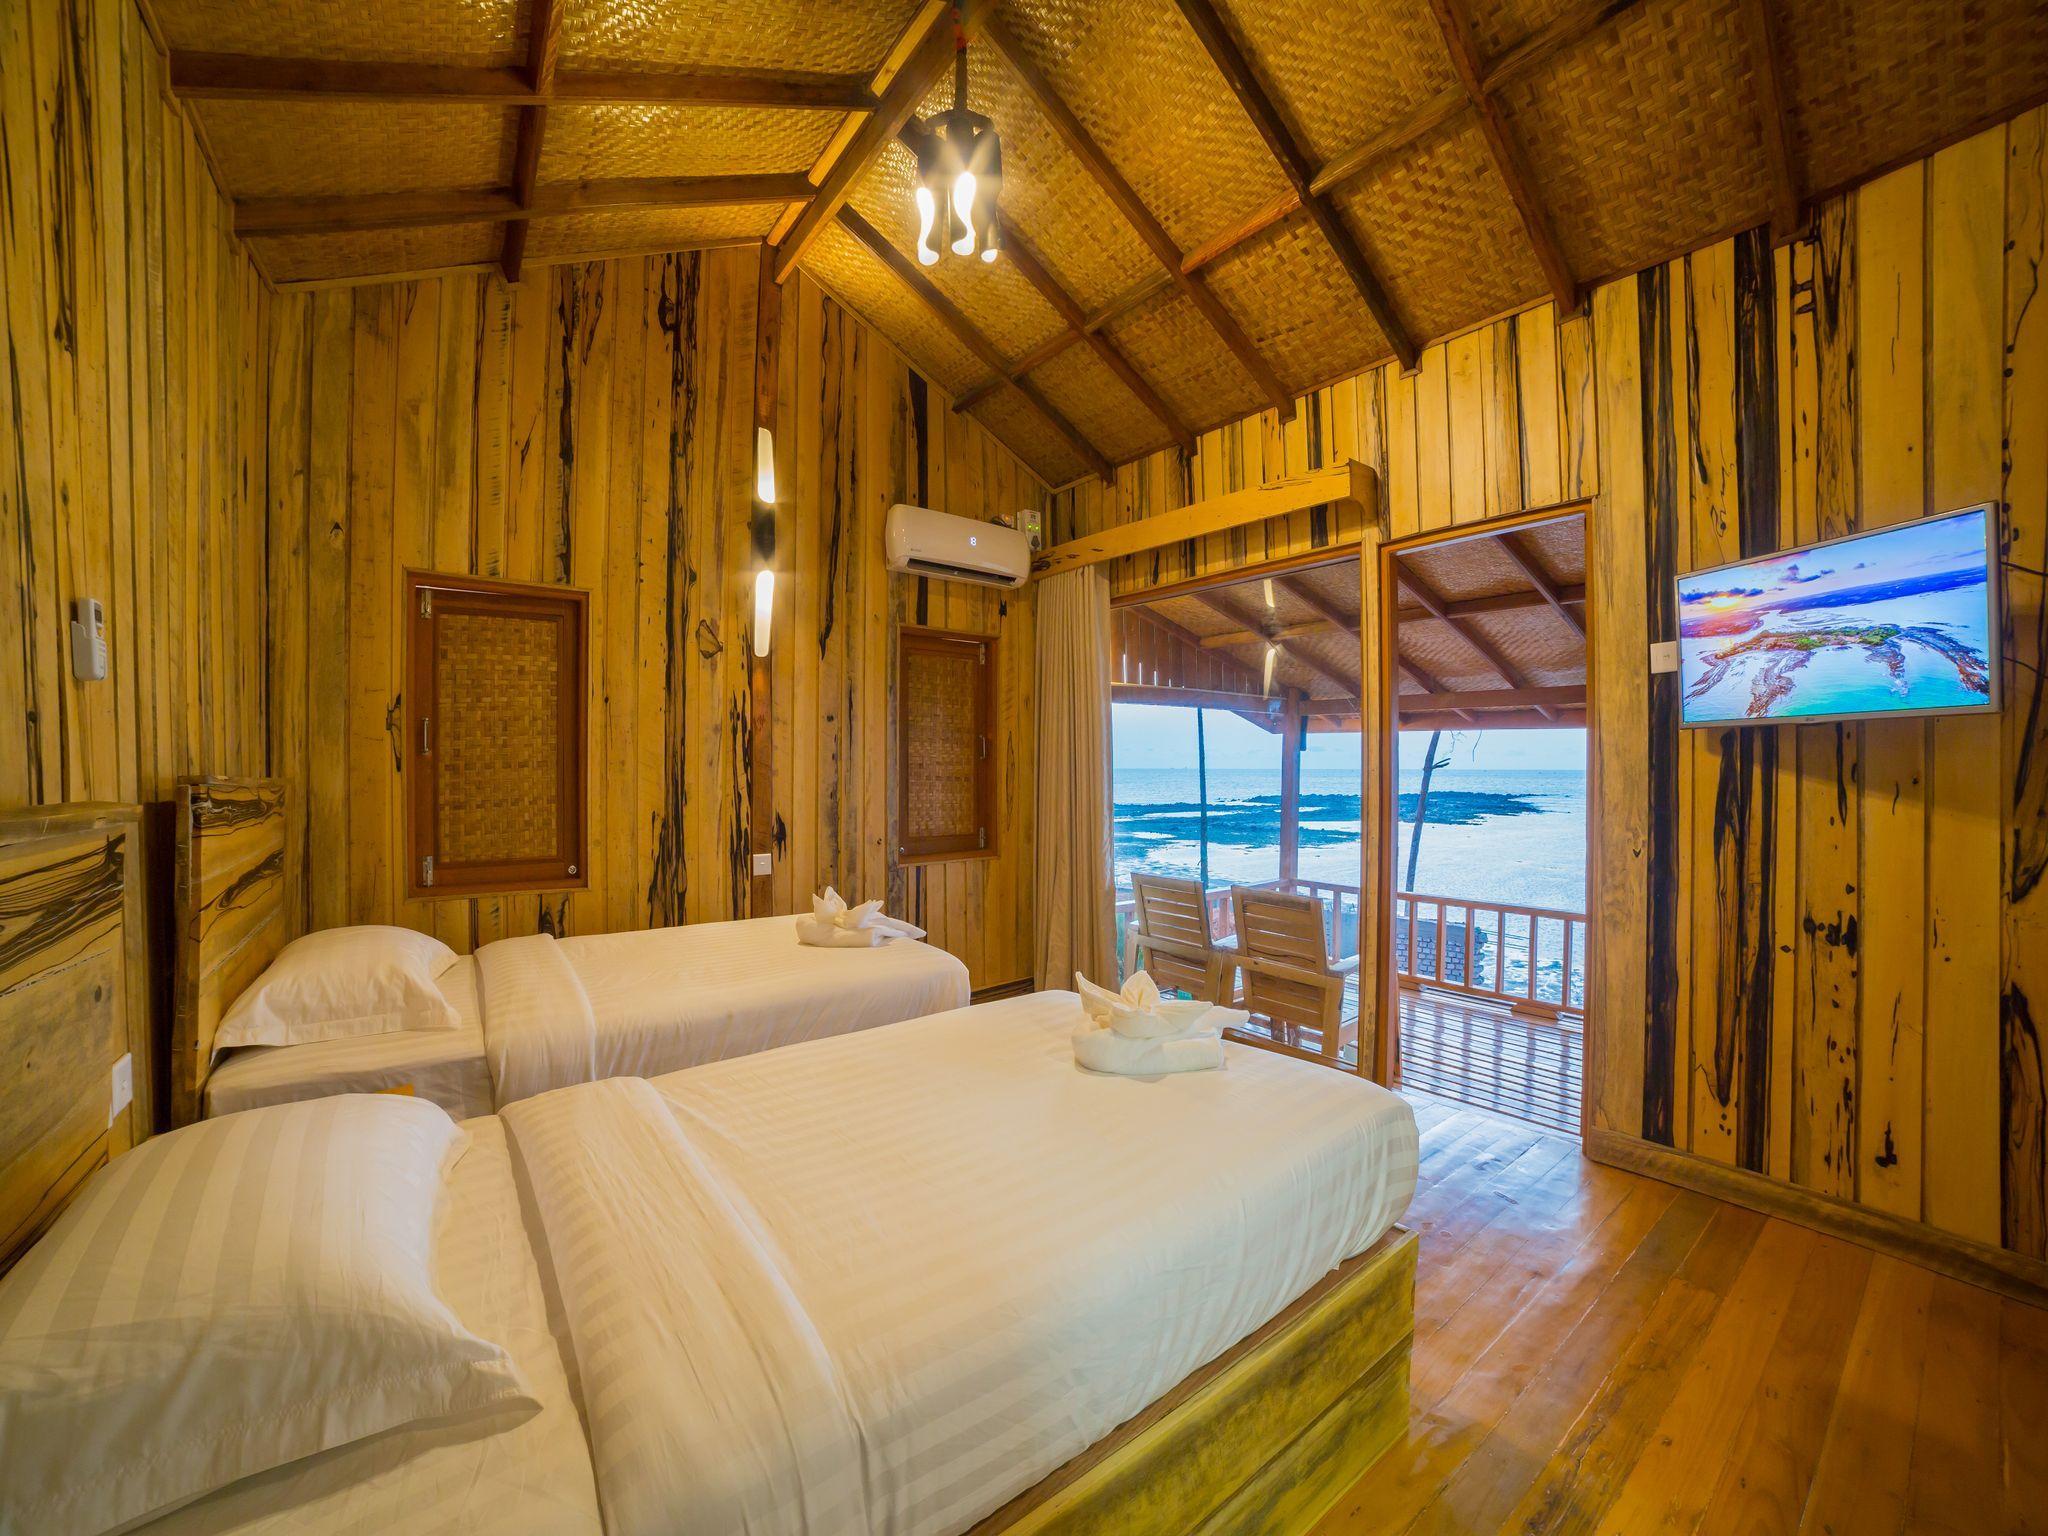 🟊 Coral View Resort - Chaungtha Beach - Myanmar